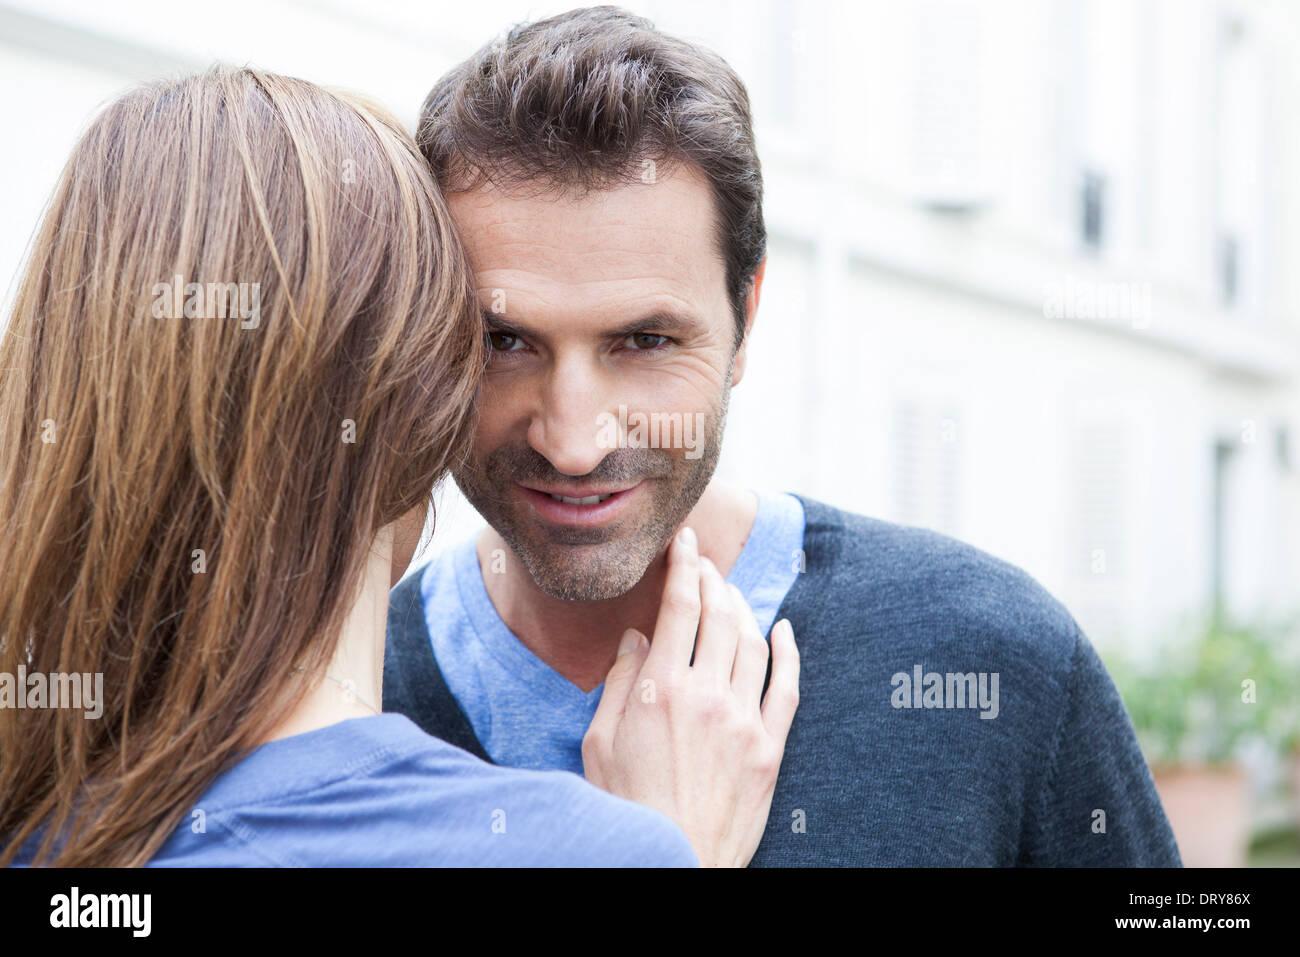 Couple embracing, man looking at camera - Stock Image